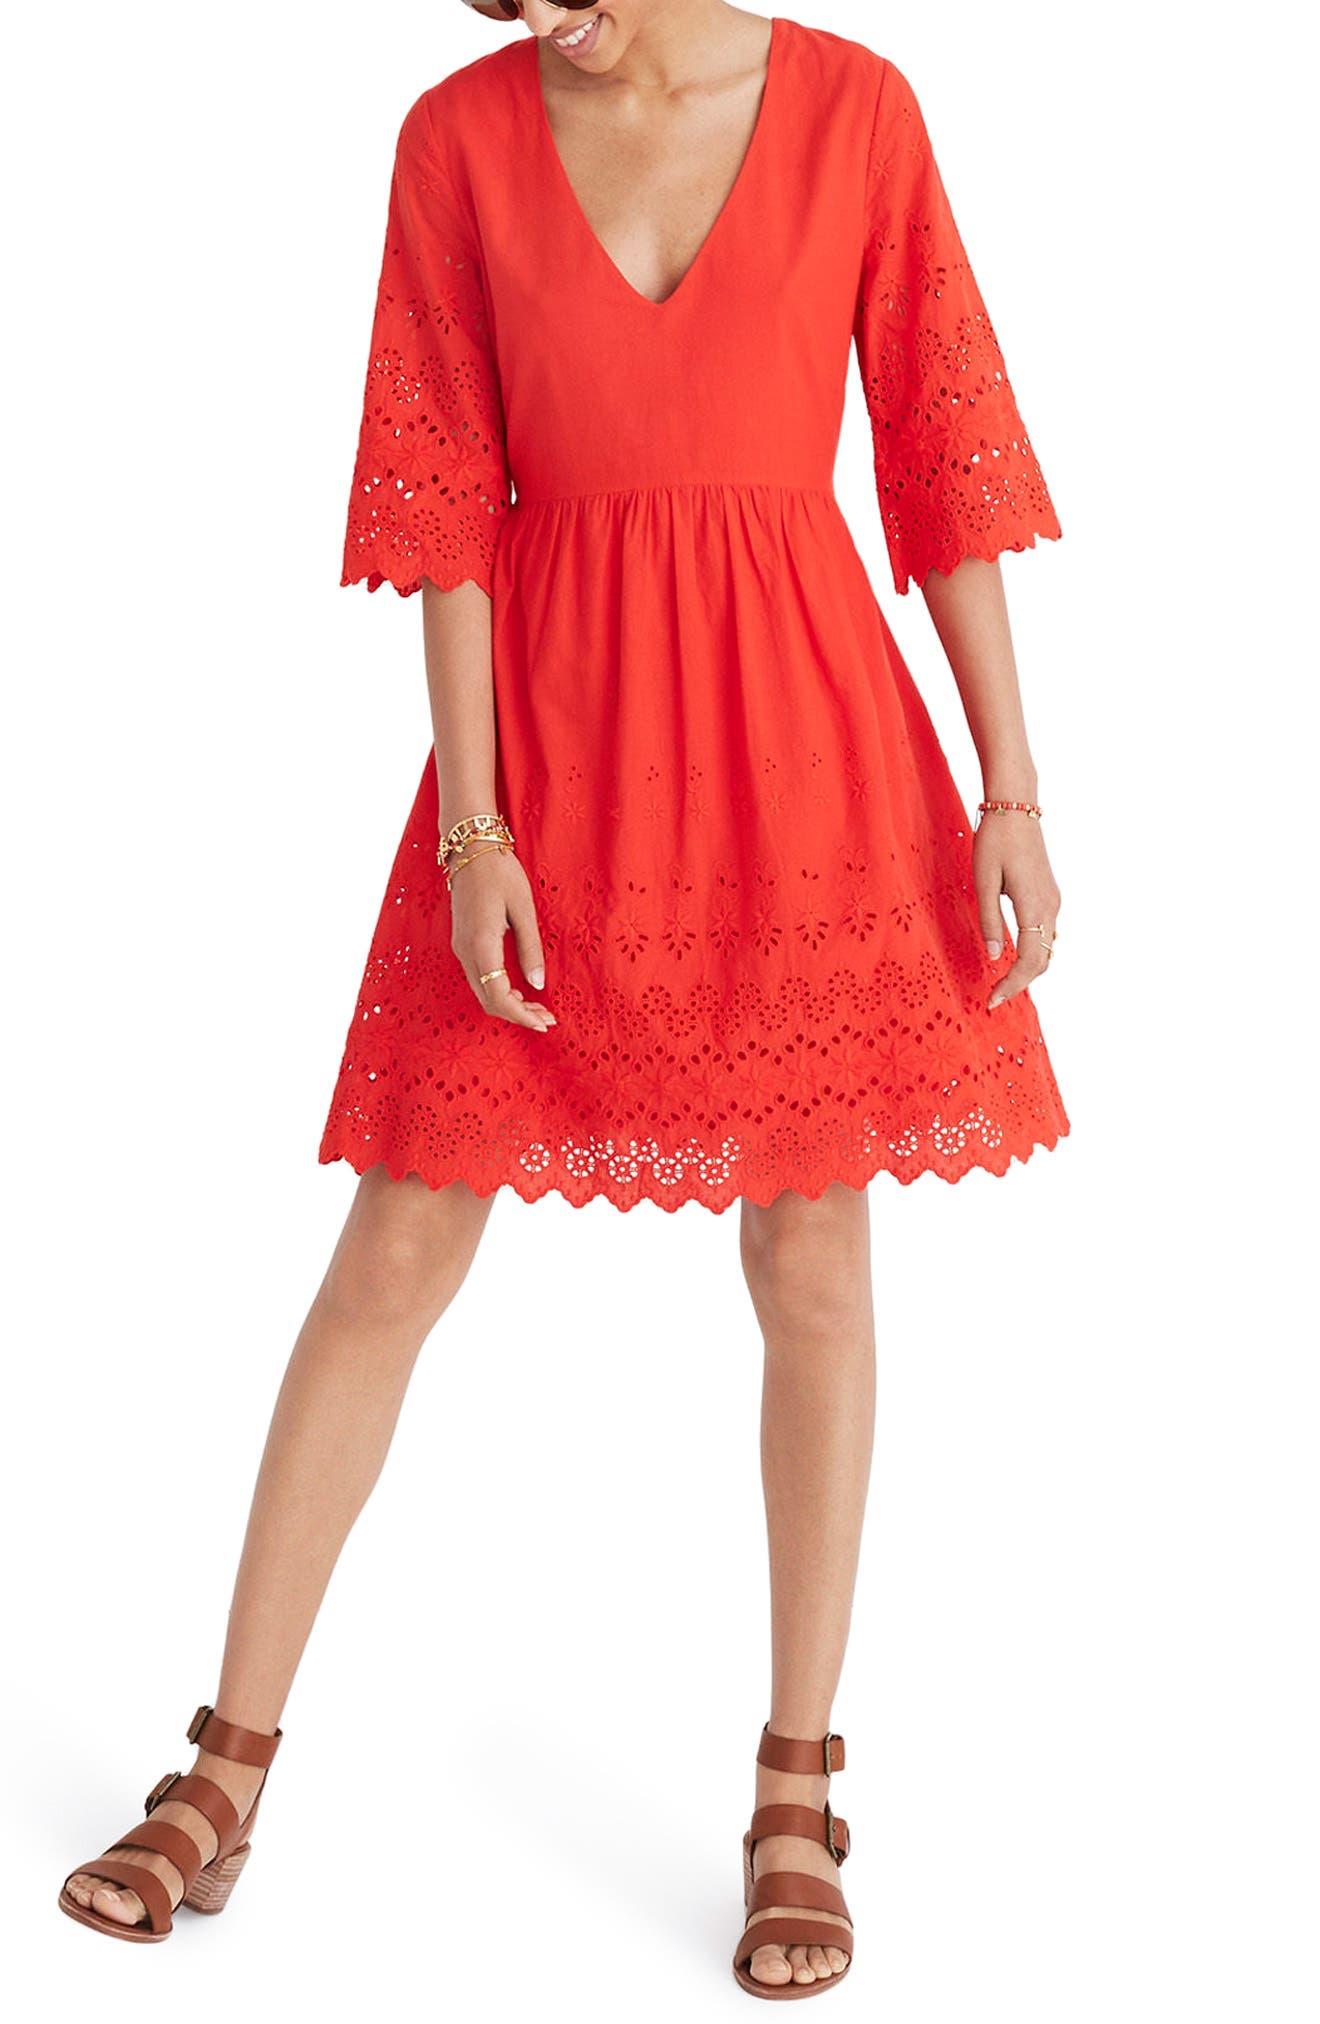 Madewell Eyelet Lattice Dress